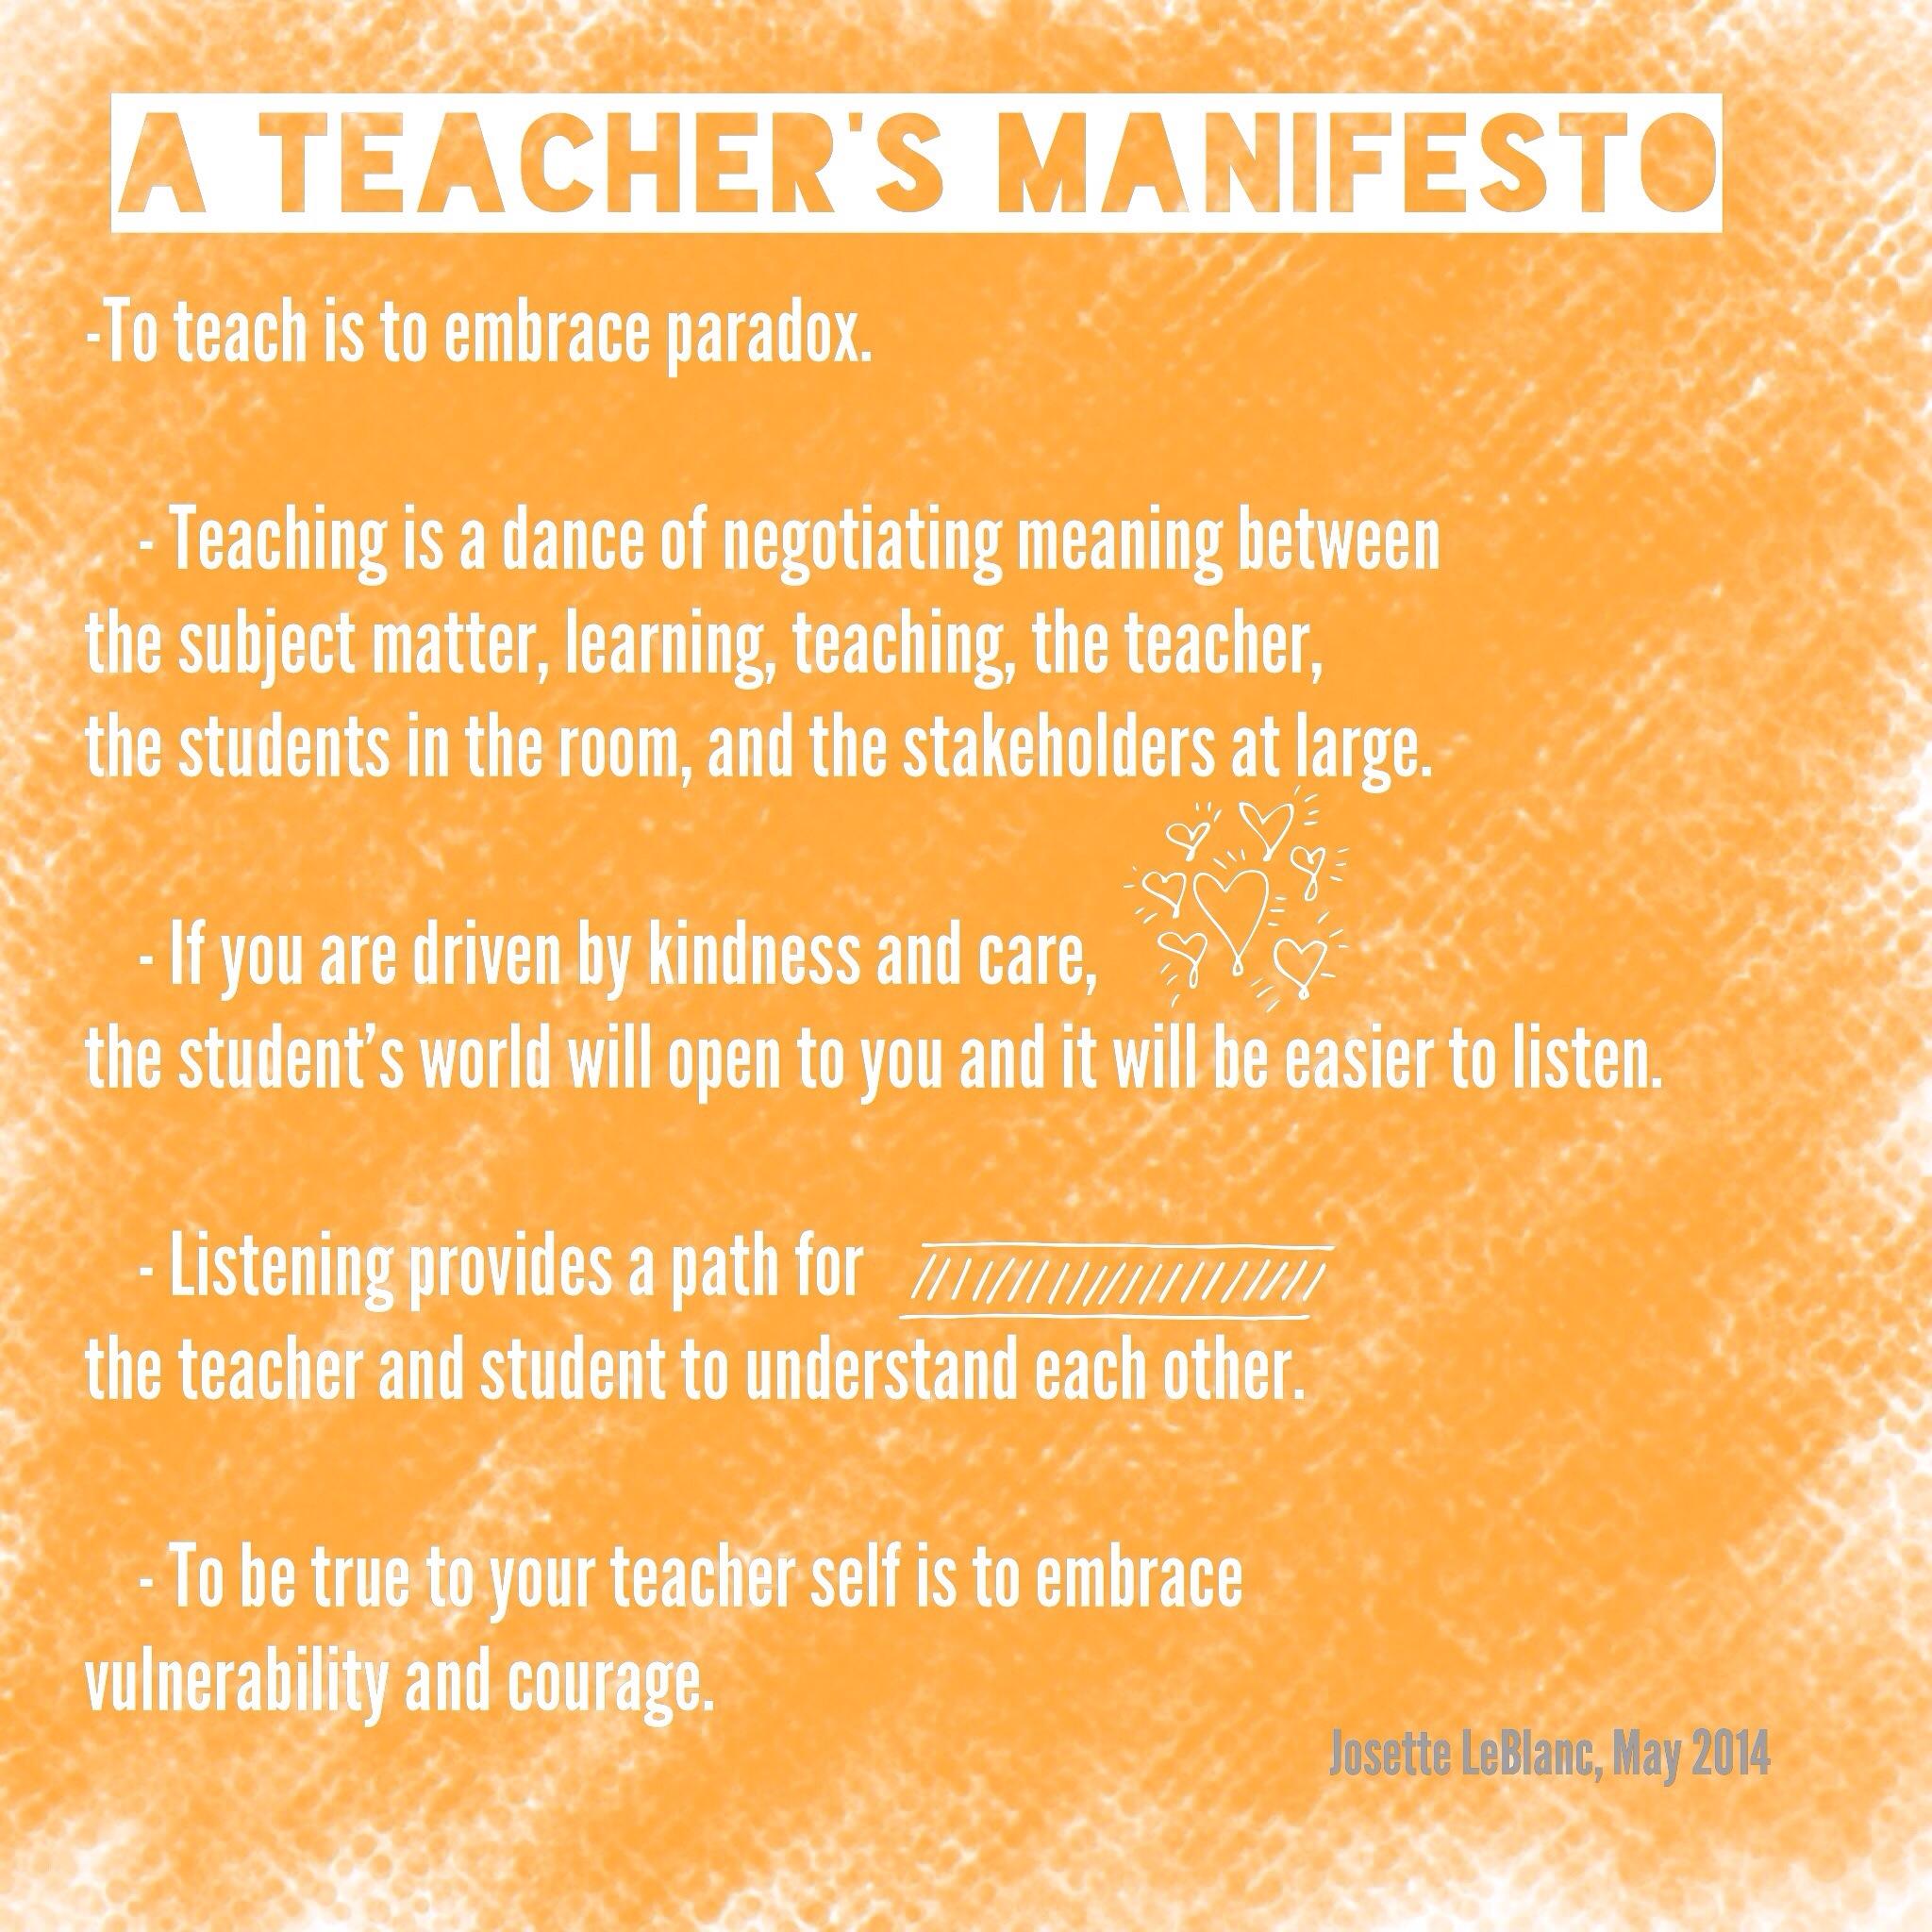 Teacher Manifesto